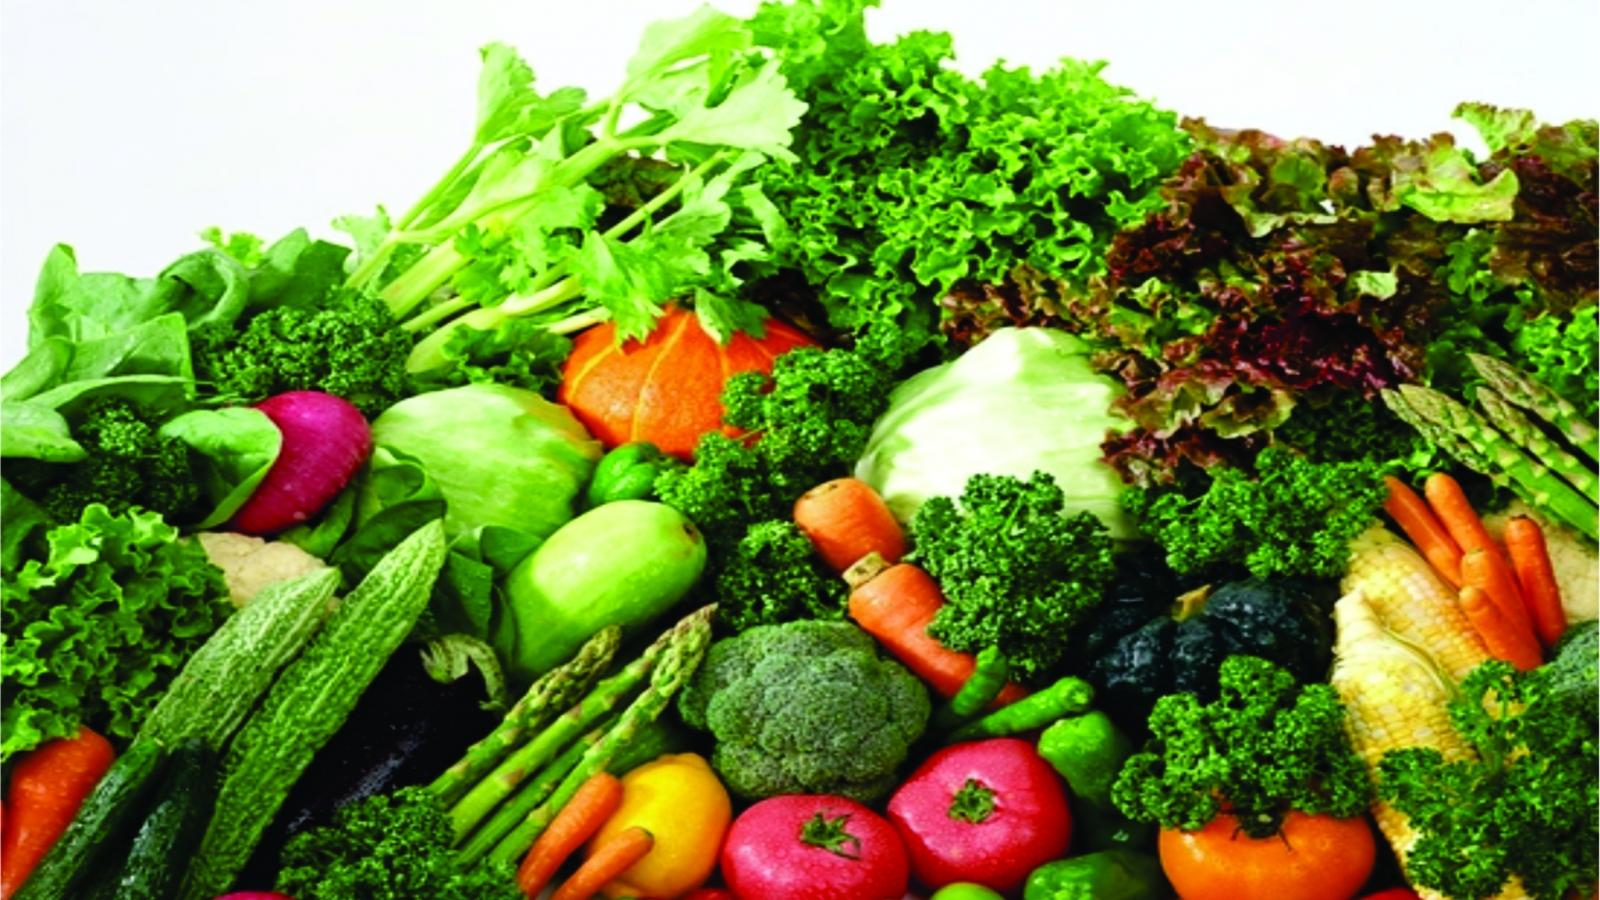 Vegetable exports to Taiwan enjoy surge